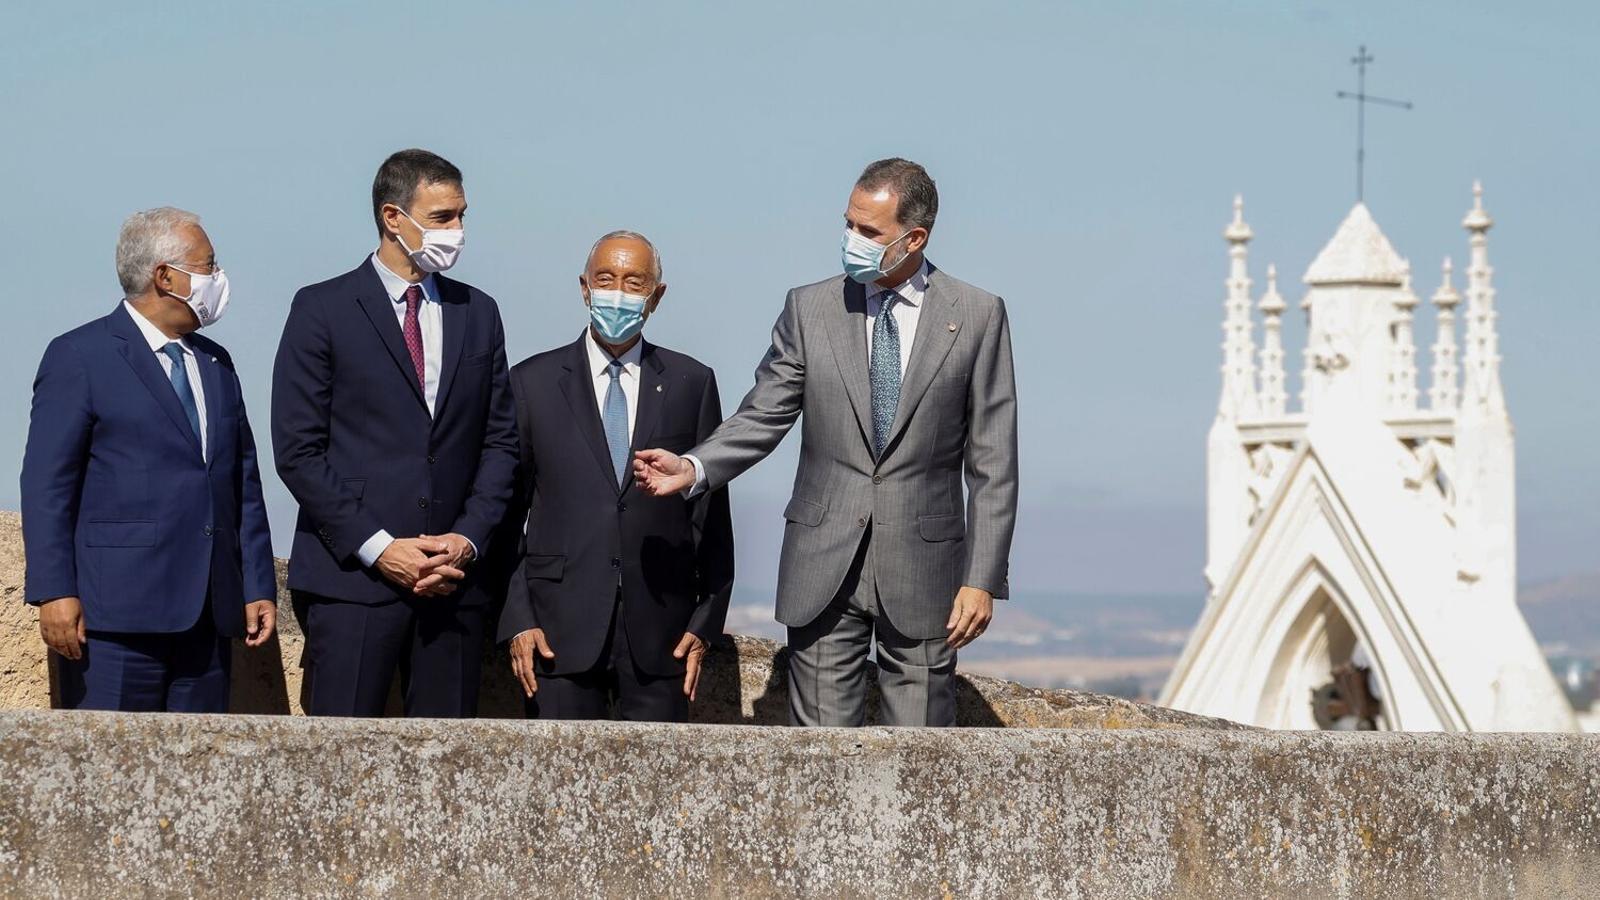 El primer ministre portuguès, António Costa, el president espanyol, Pedro Sánchez, el president de Portugal, Marcelo Rebelo de Sousa, i Felip VI durant l'acte institucional de reobertura de la frontera a Badajoz / BALLESTEROS / EFE